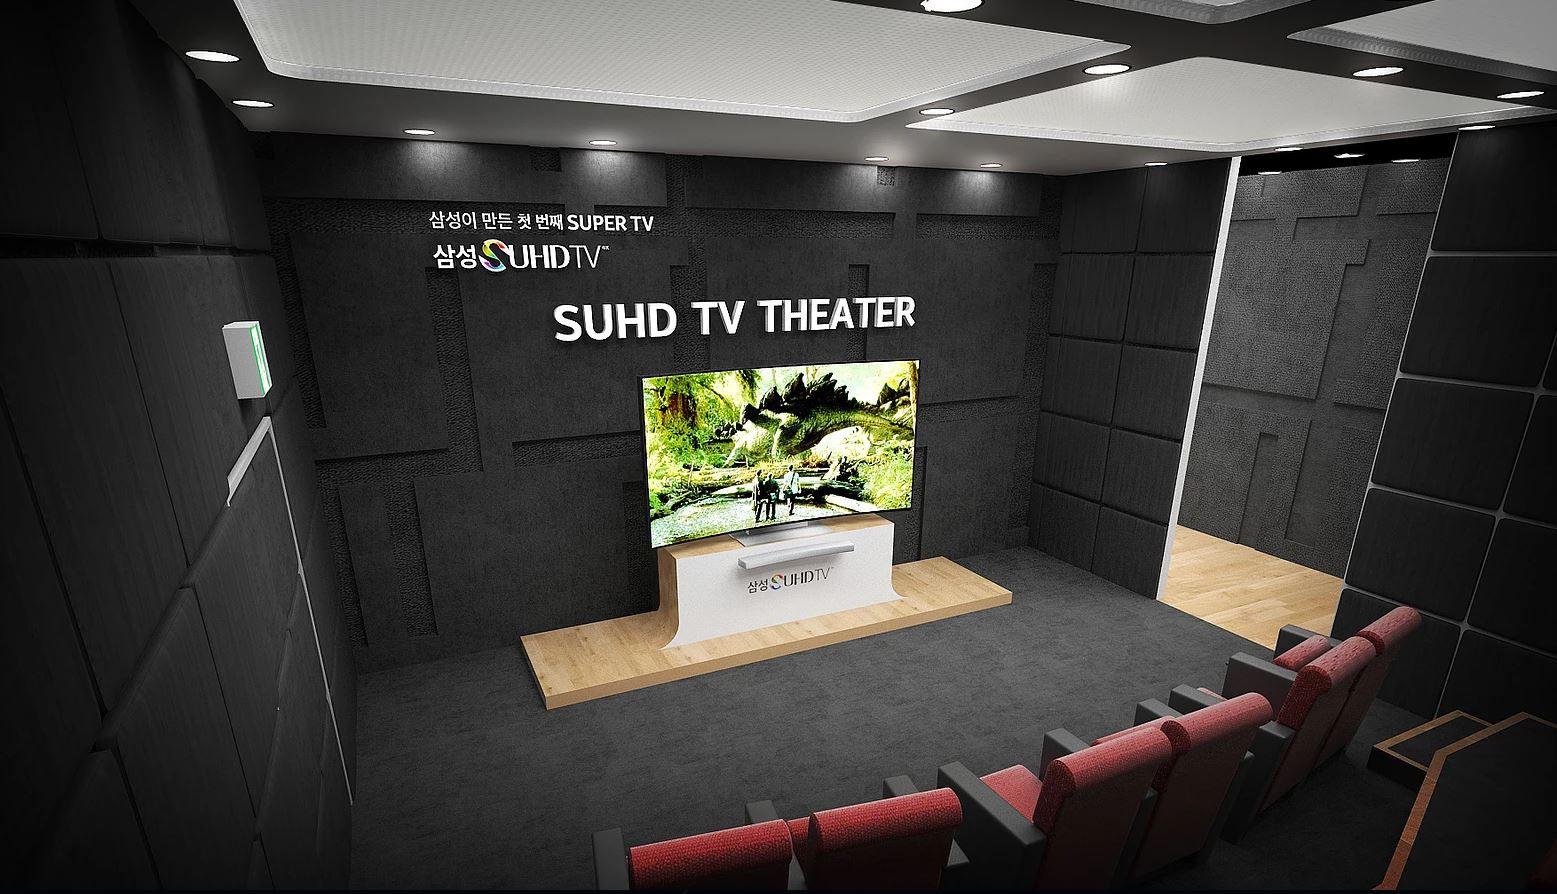 SAMSUNG SUHD TV LAUNCHING